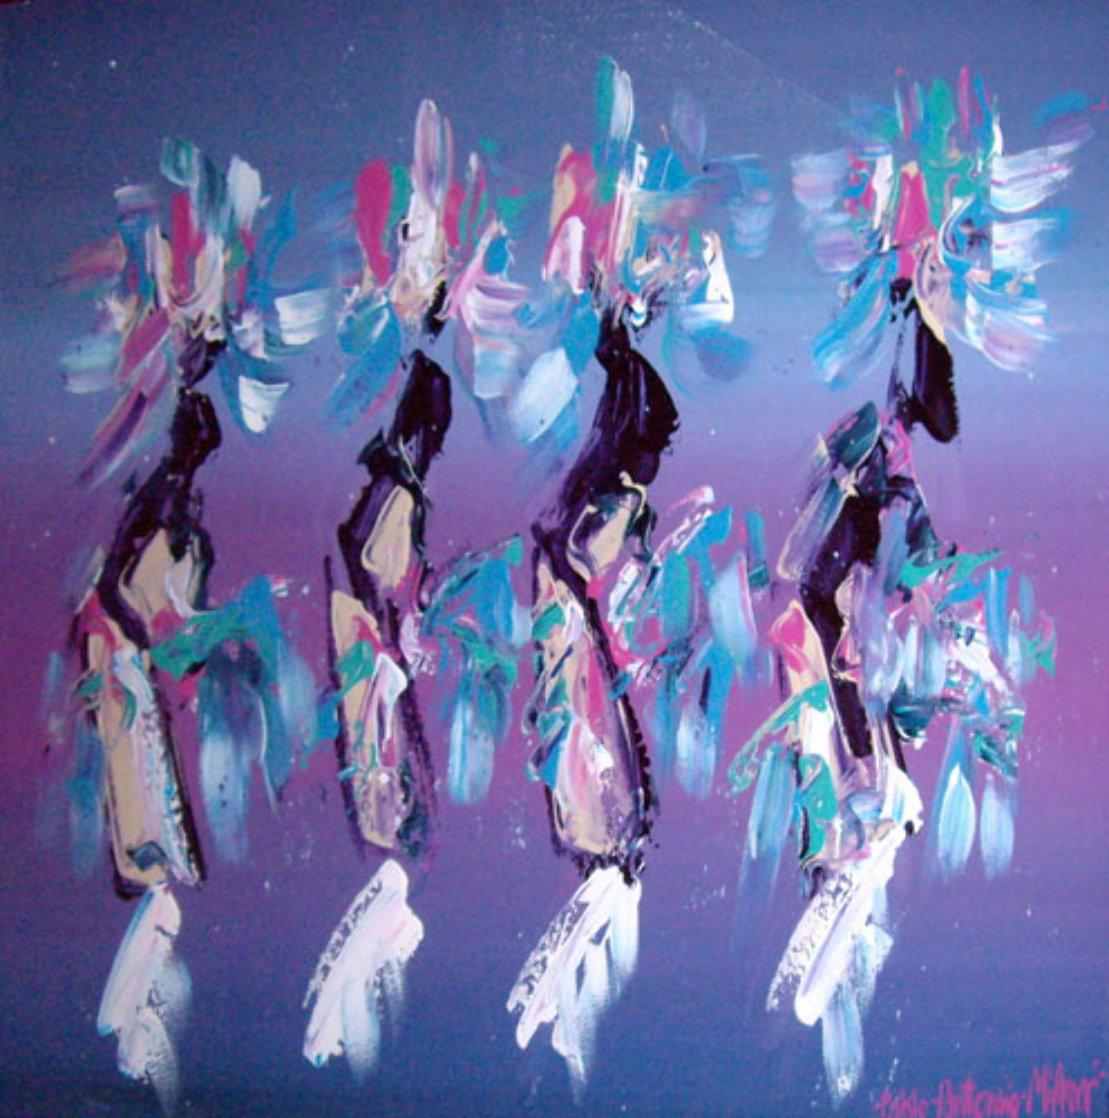 Kachina Dancers 1991 37x48 Super Huge Original Painting by Pablo Antonio Milan